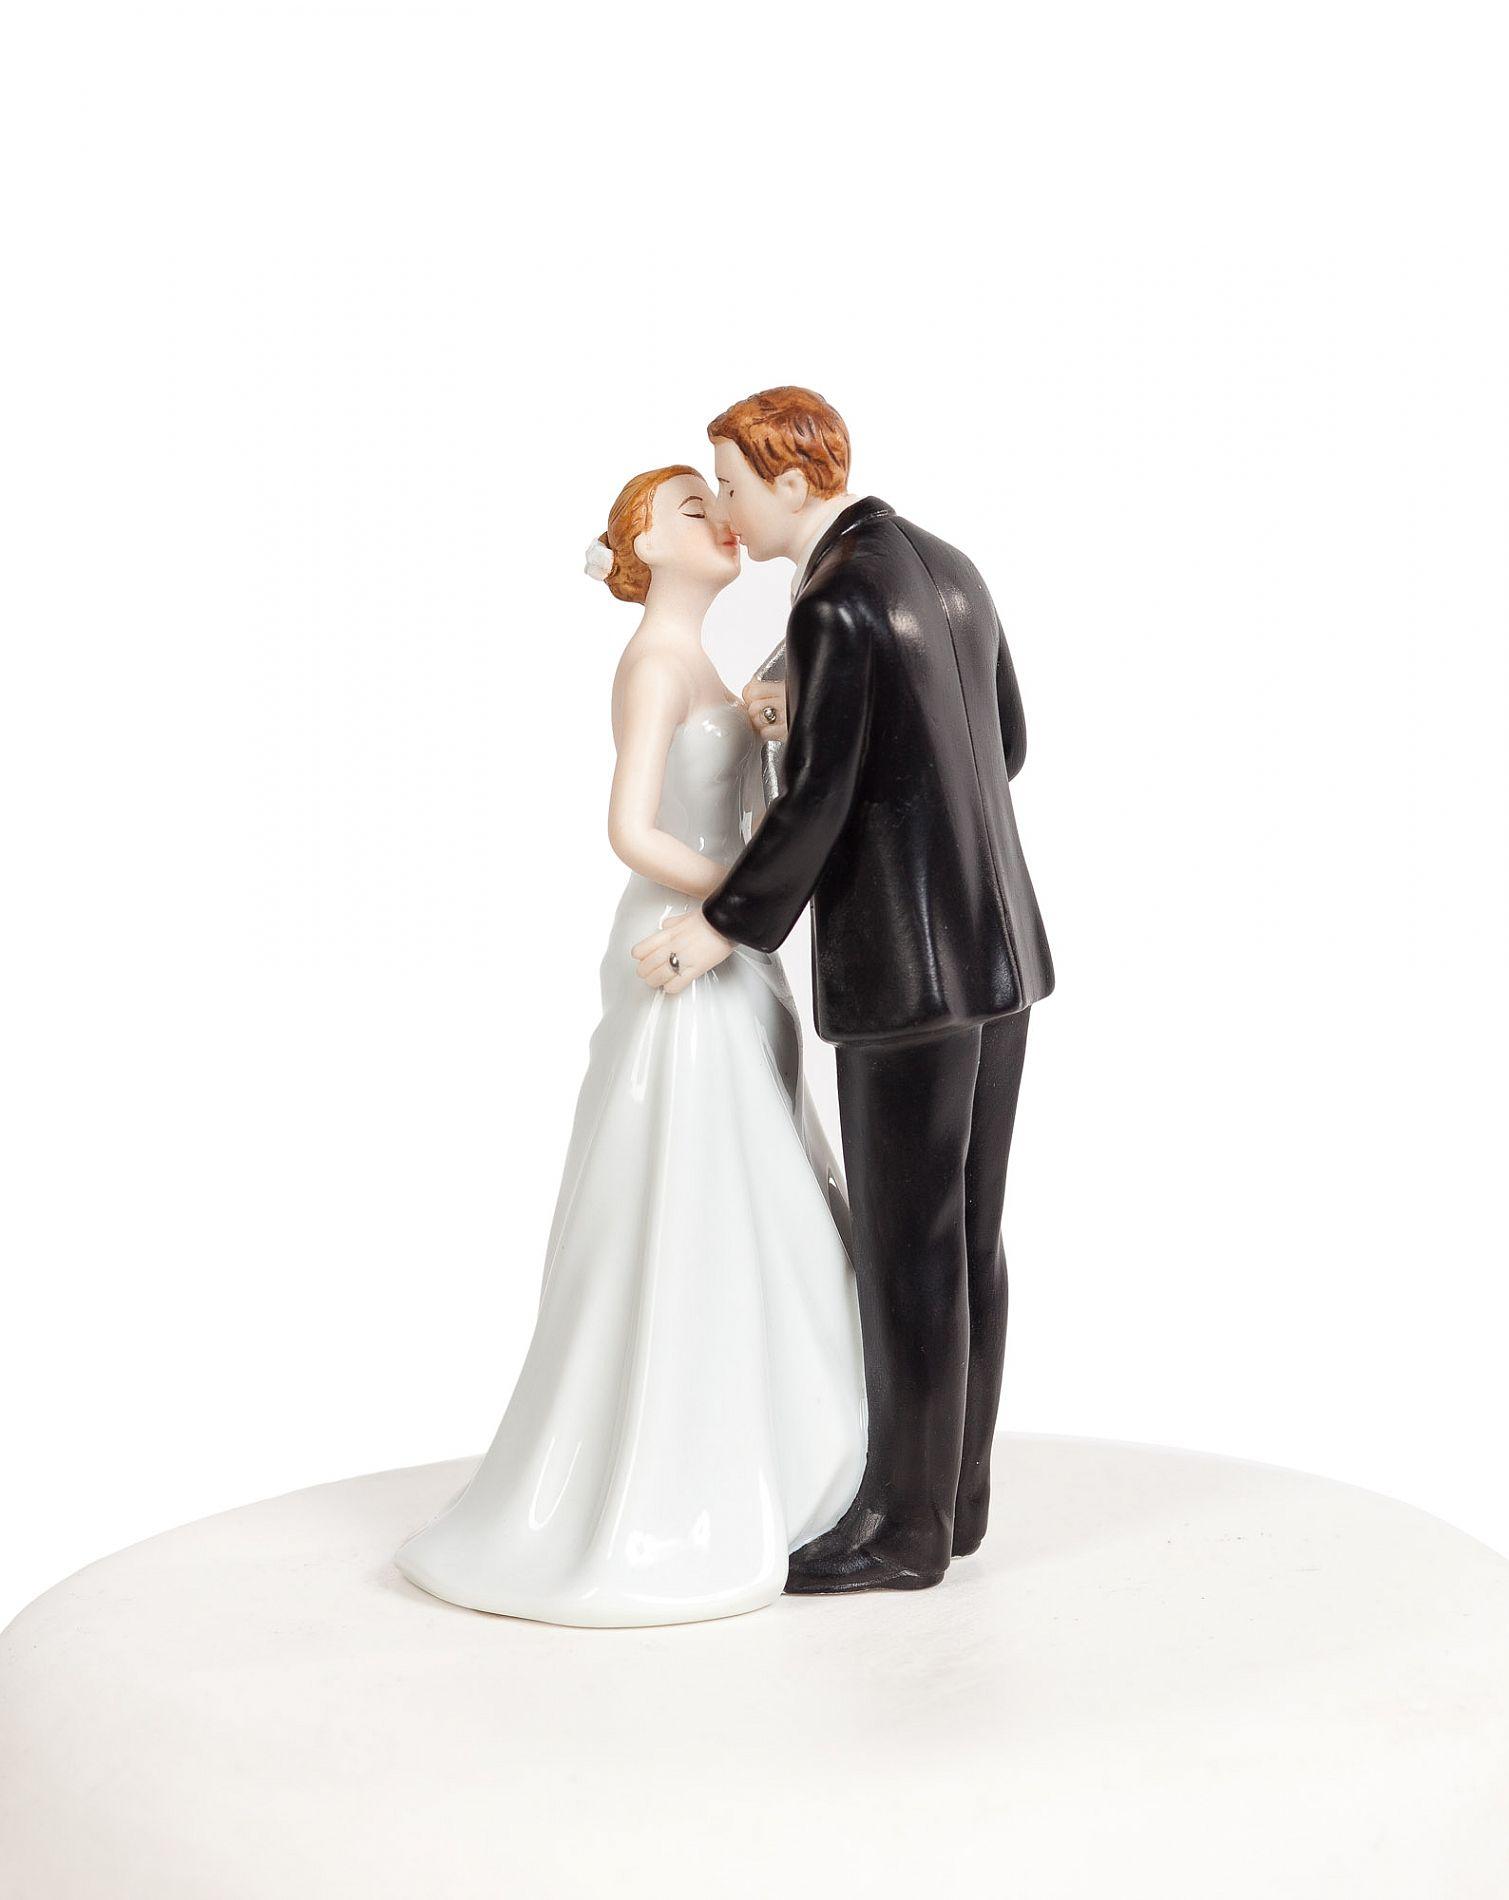 wedding tie knot photo - 1